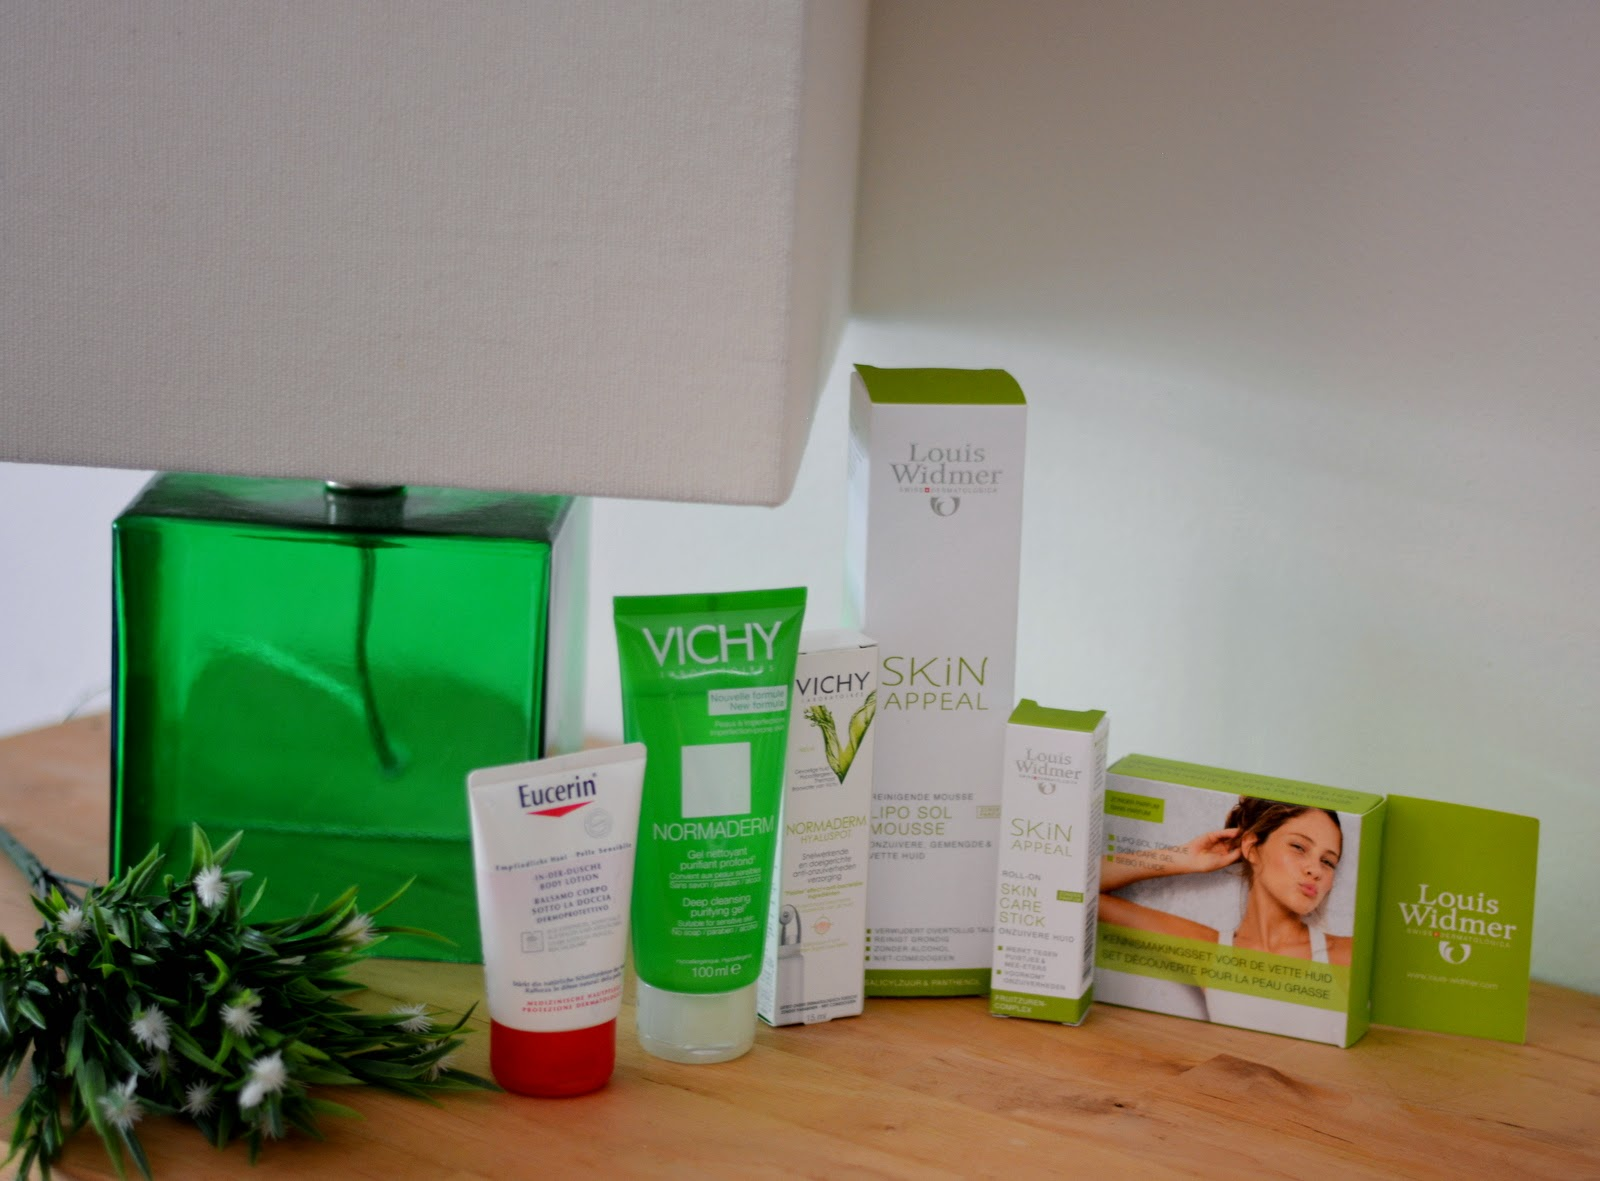 Skin care - Farmaline - Eucerin - Vichy - Louis Widmer - Beauty Blogger